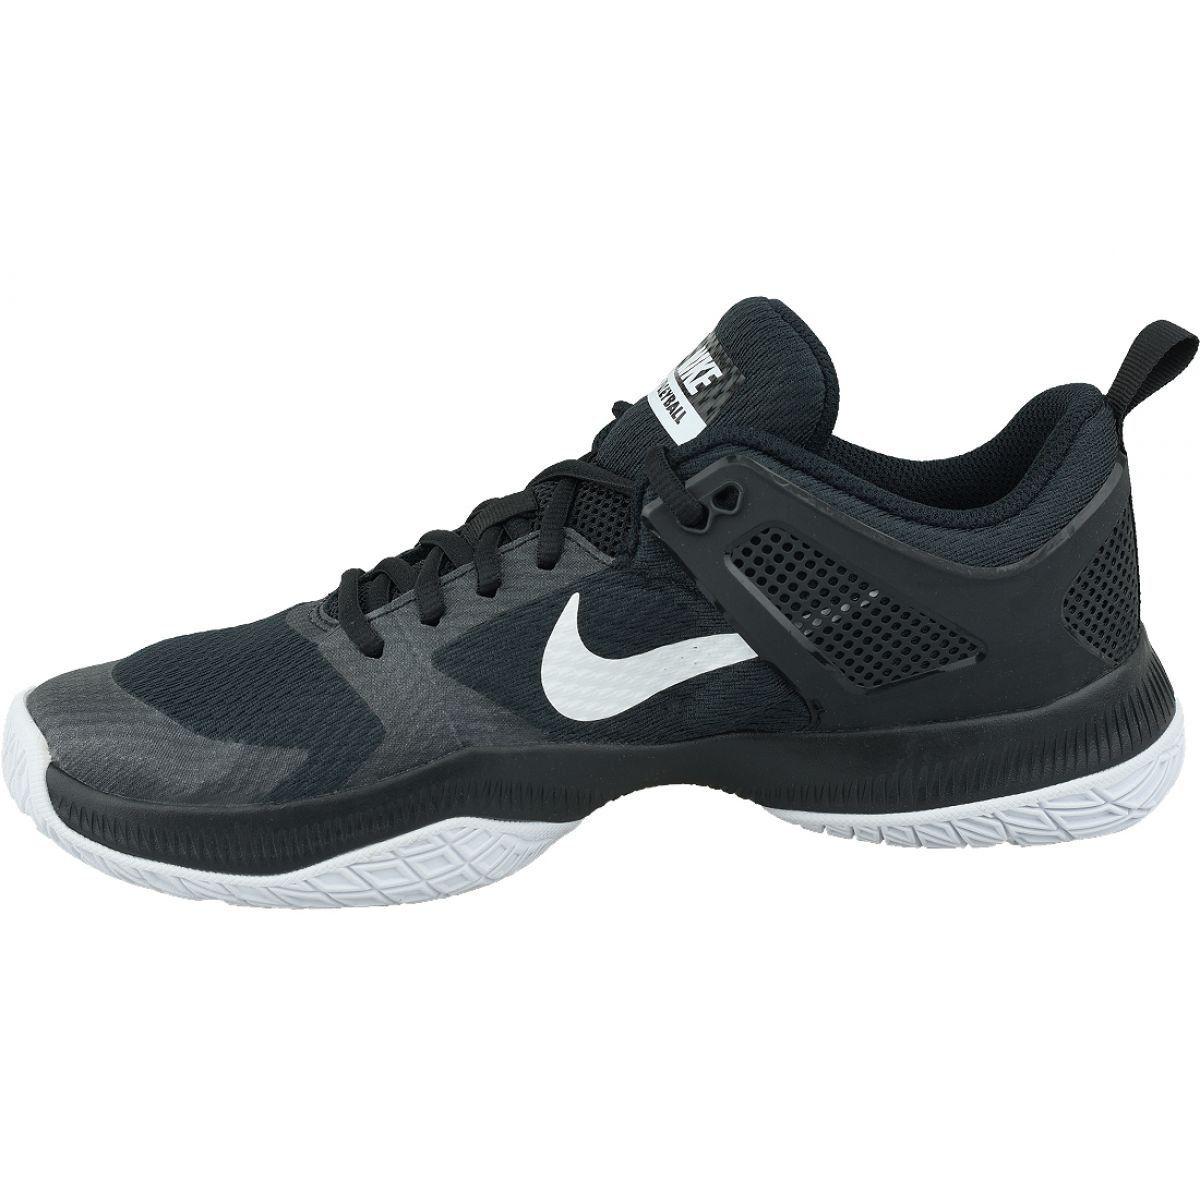 Buty Nike Air Zoom Hyperace M 902367 001 Czarne Nike Air Zoom Nike Nike Air